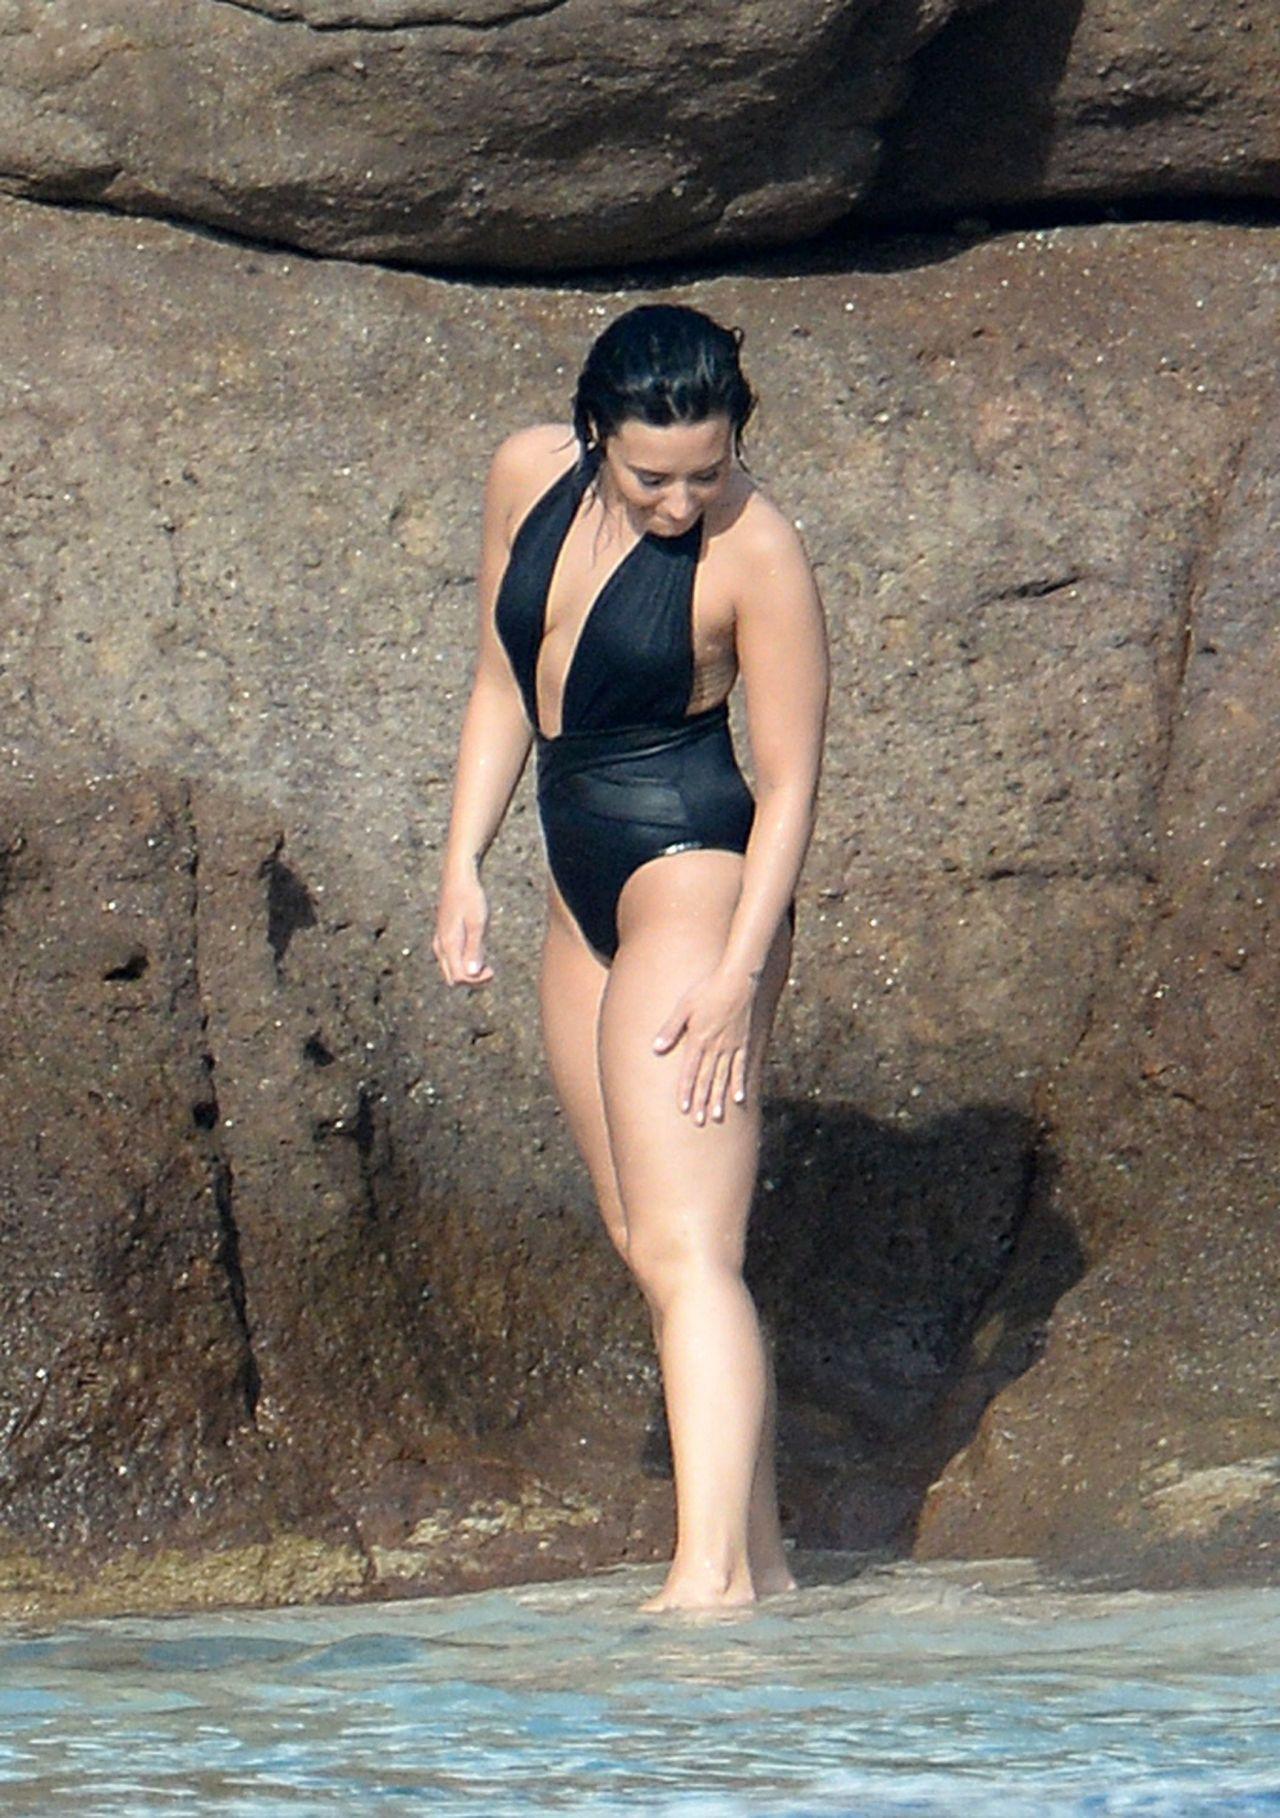 Erotica Topless Zsuzsa Csisztu  nudes (45 pics), Twitter, bra